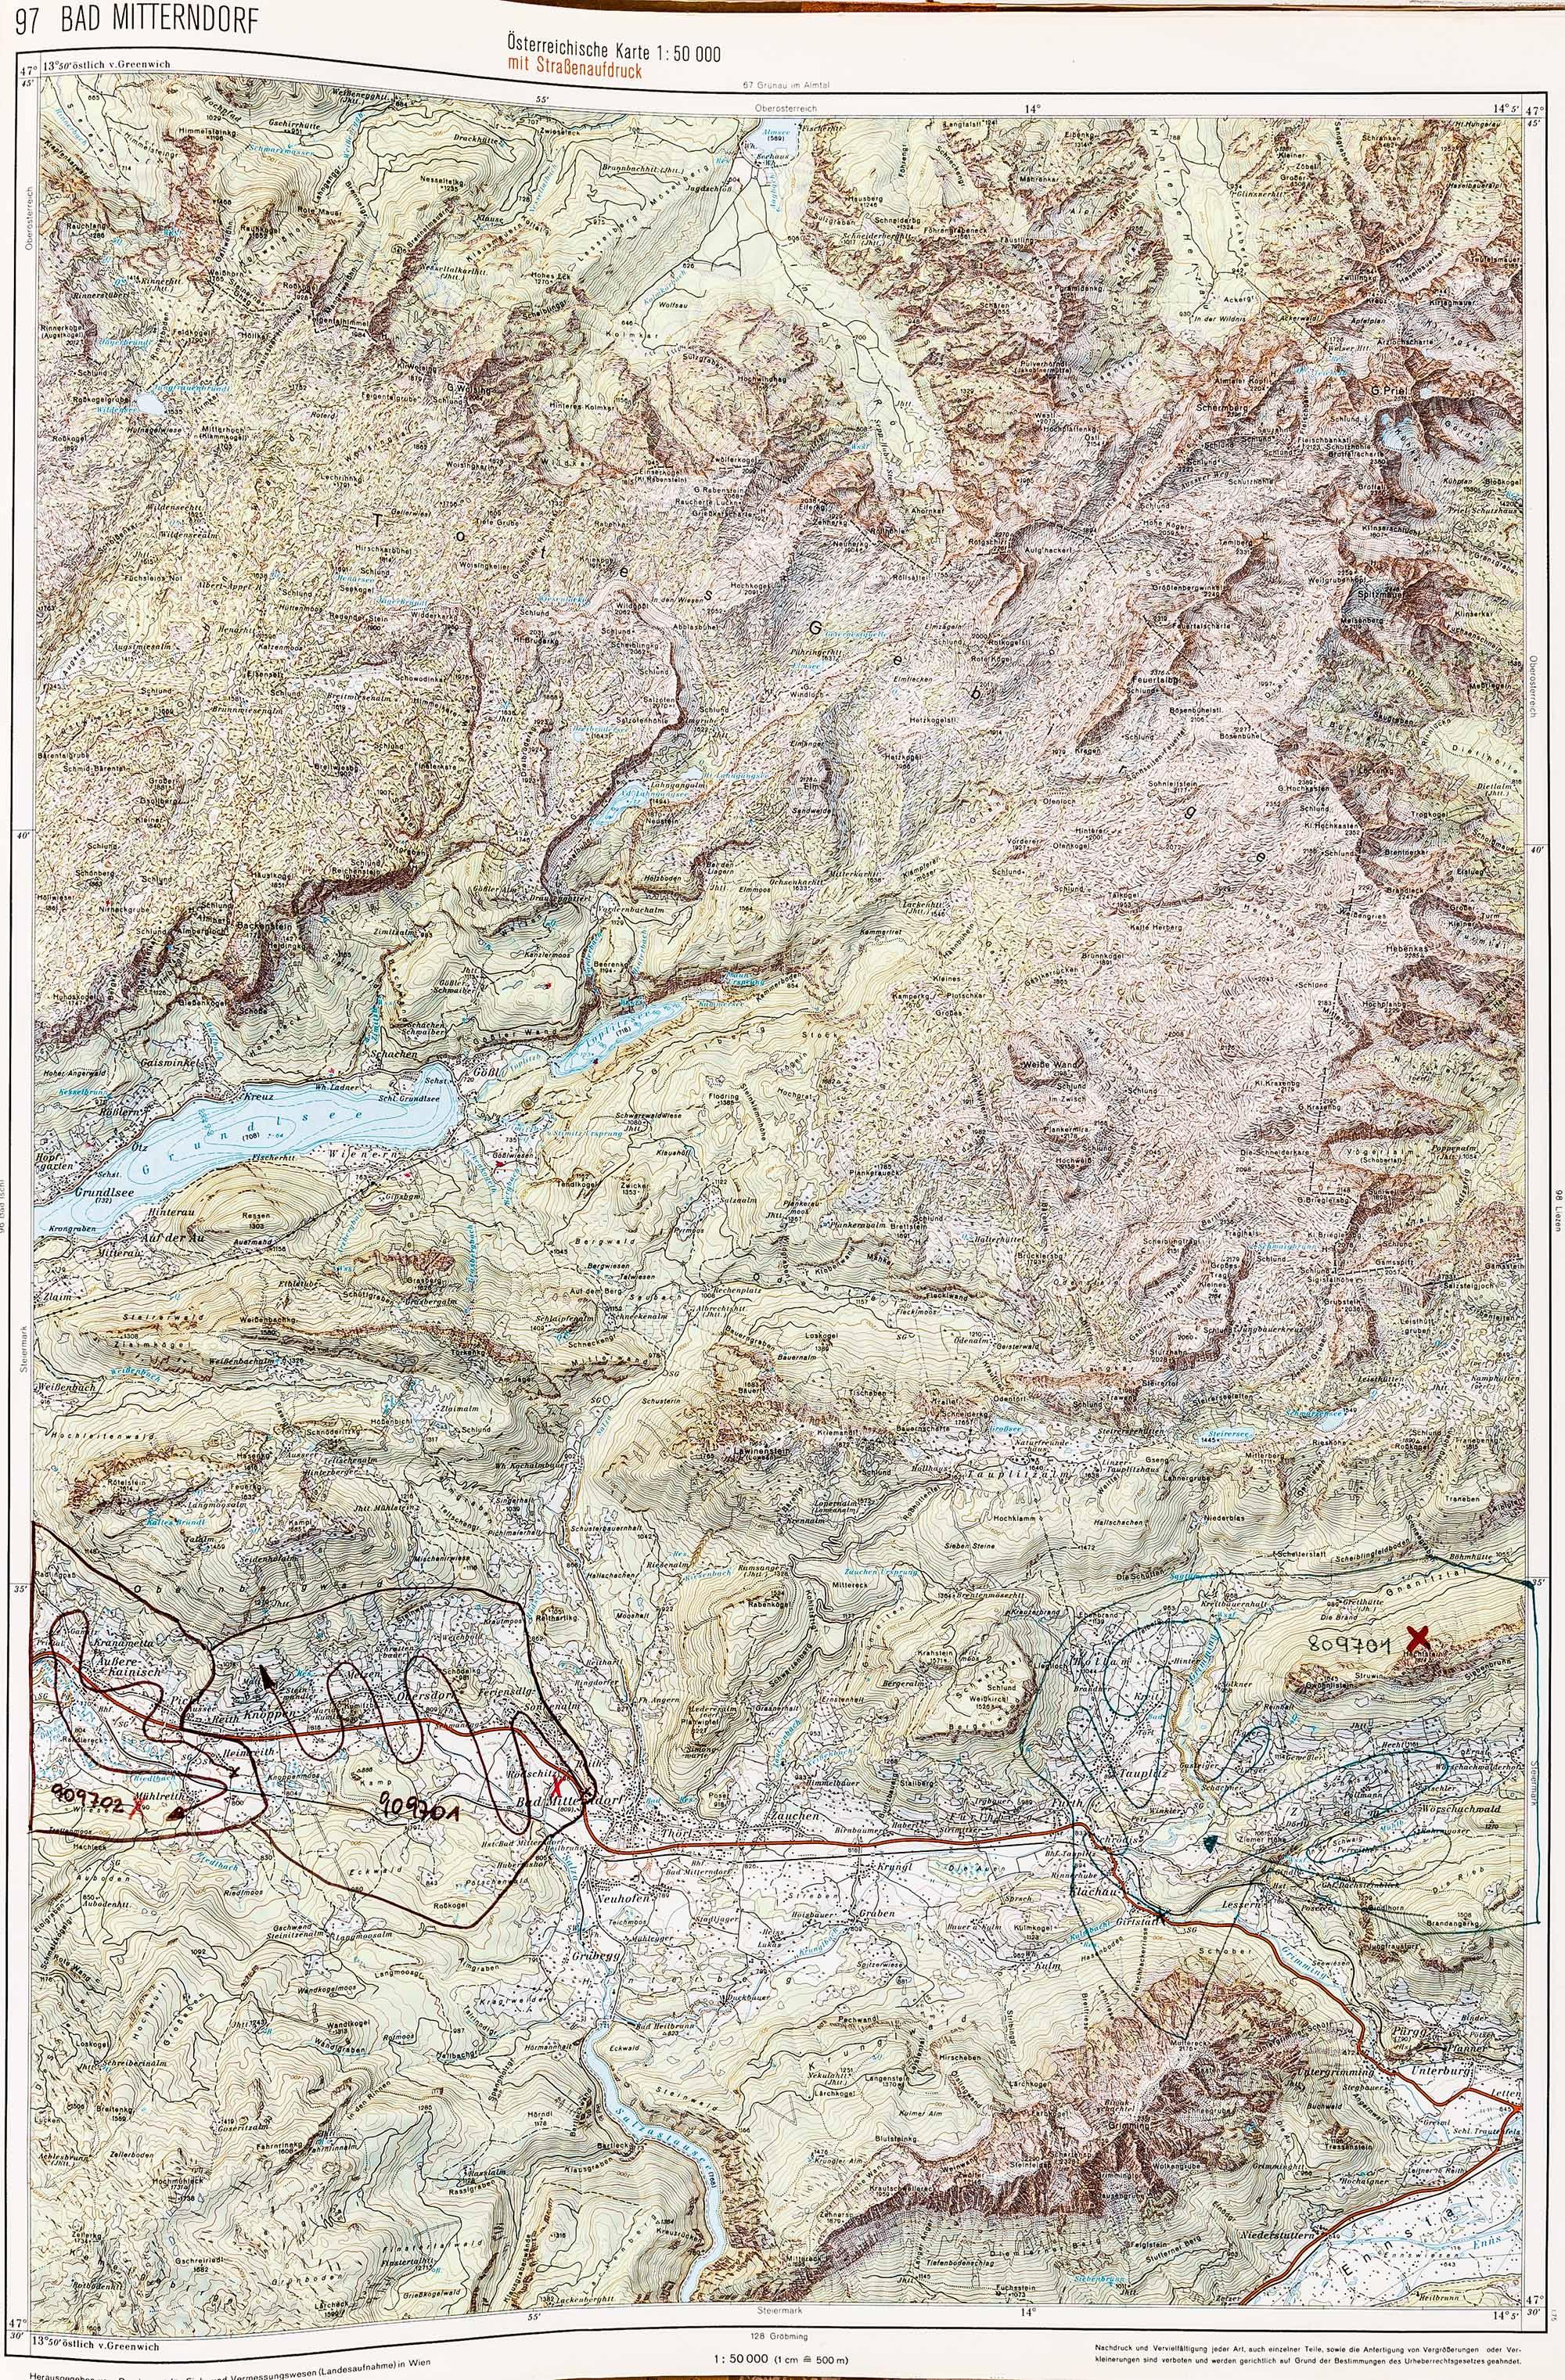 1975-1979 Karte 097